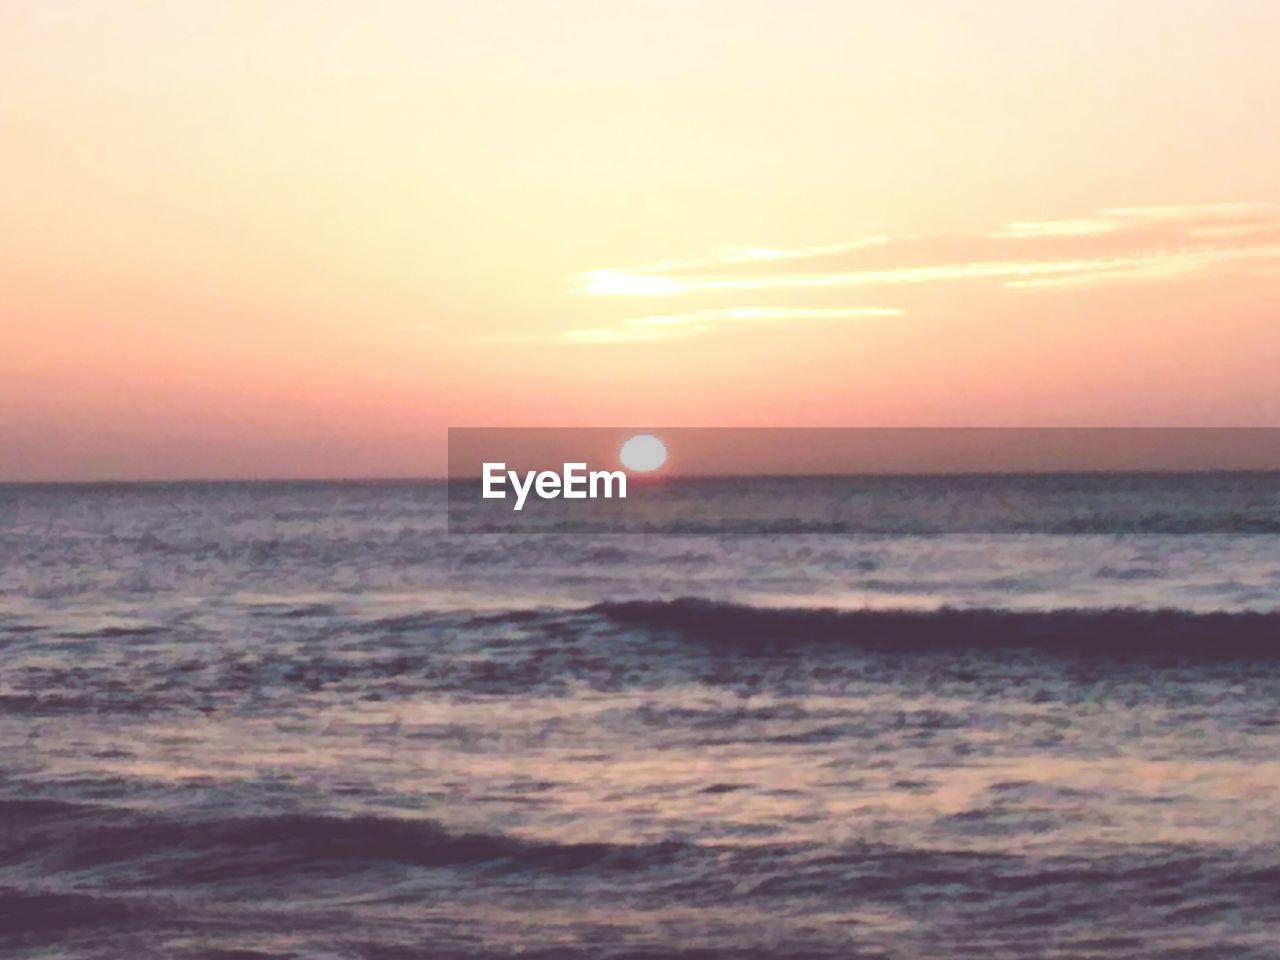 sea, sunset, scenics, beauty in nature, horizon over water, nature, tranquility, tranquil scene, sun, idyllic, sky, water, beach, no people, outdoors, horizon